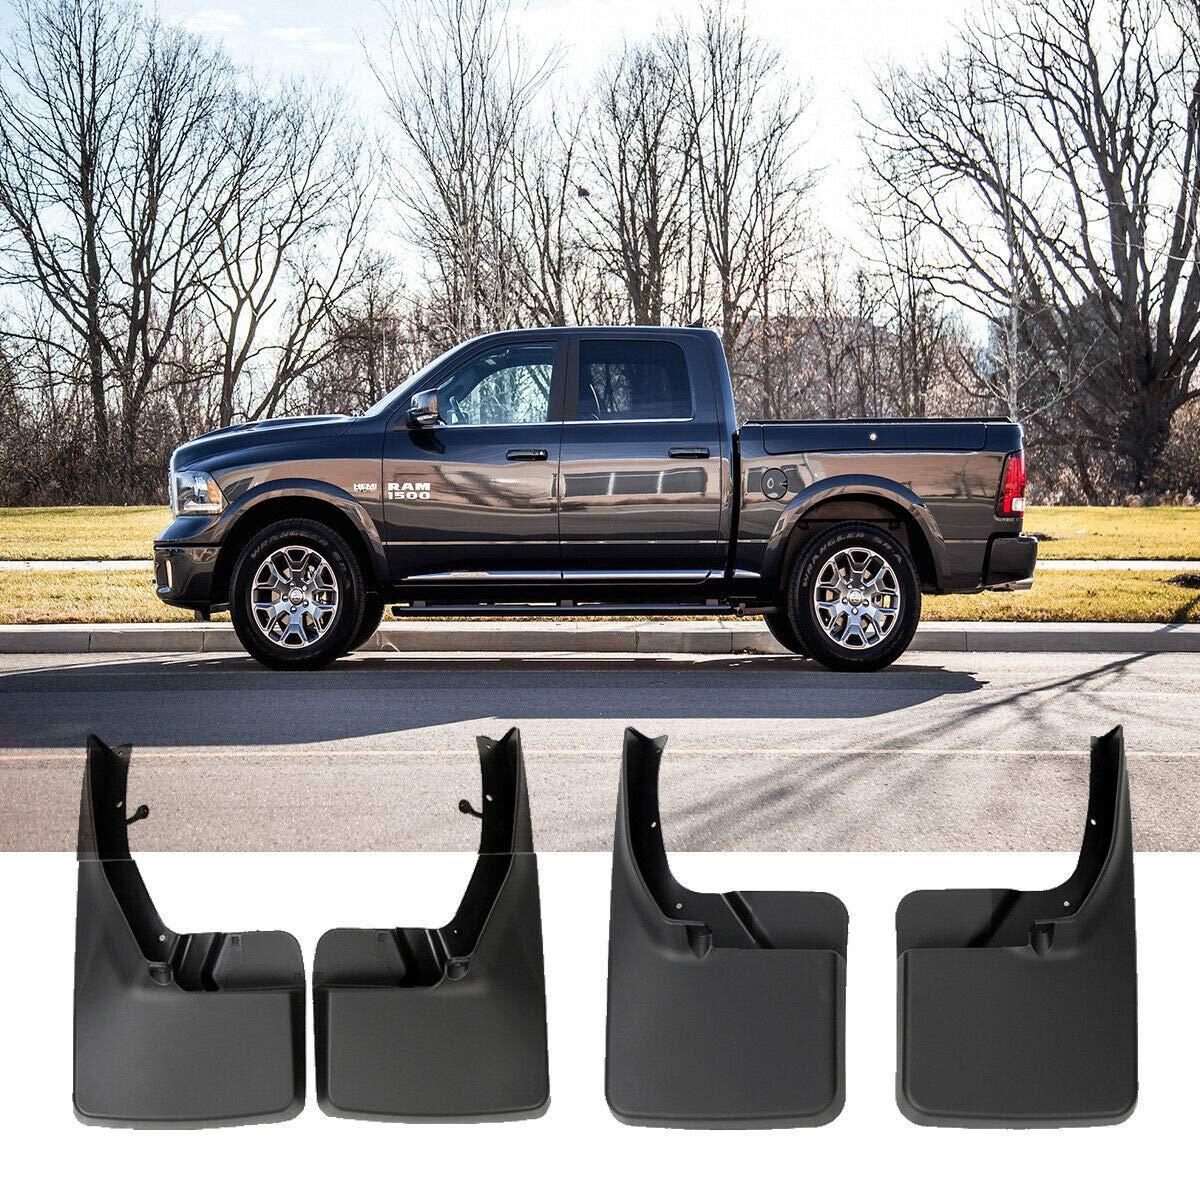 Set of 4 Mud Flaps Splash Guard for 2009-2018 Dodge Ram 1500 2500 3500 without Fender Flares